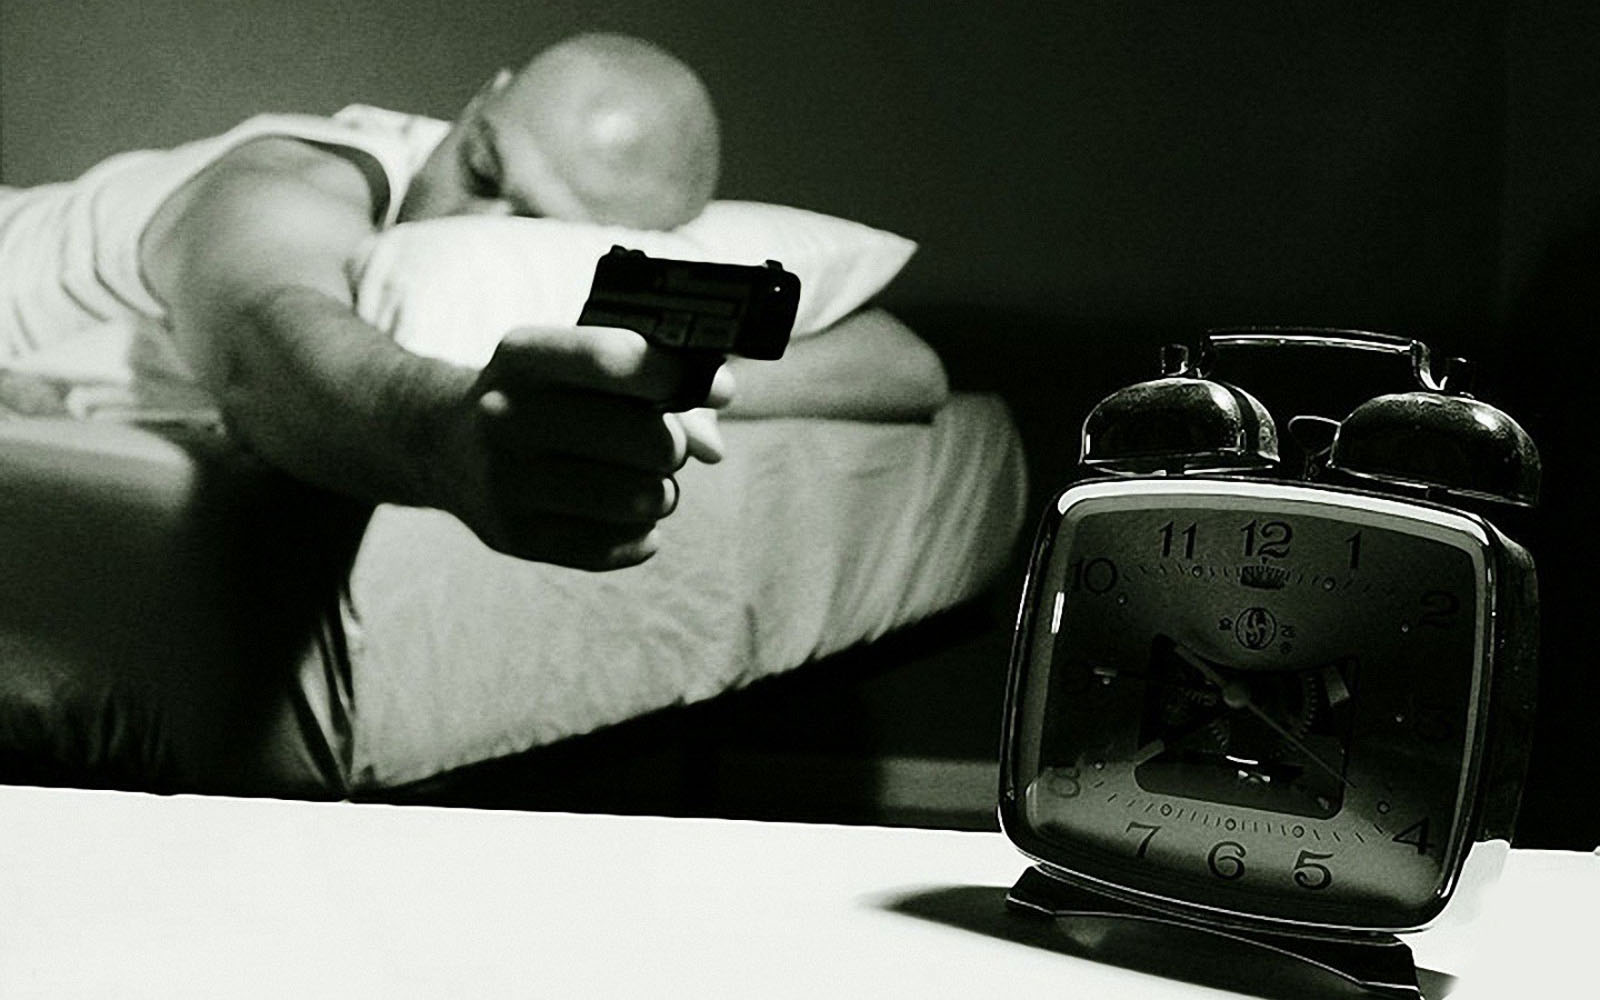 funny_alarm_clock_wallpapers.jpg